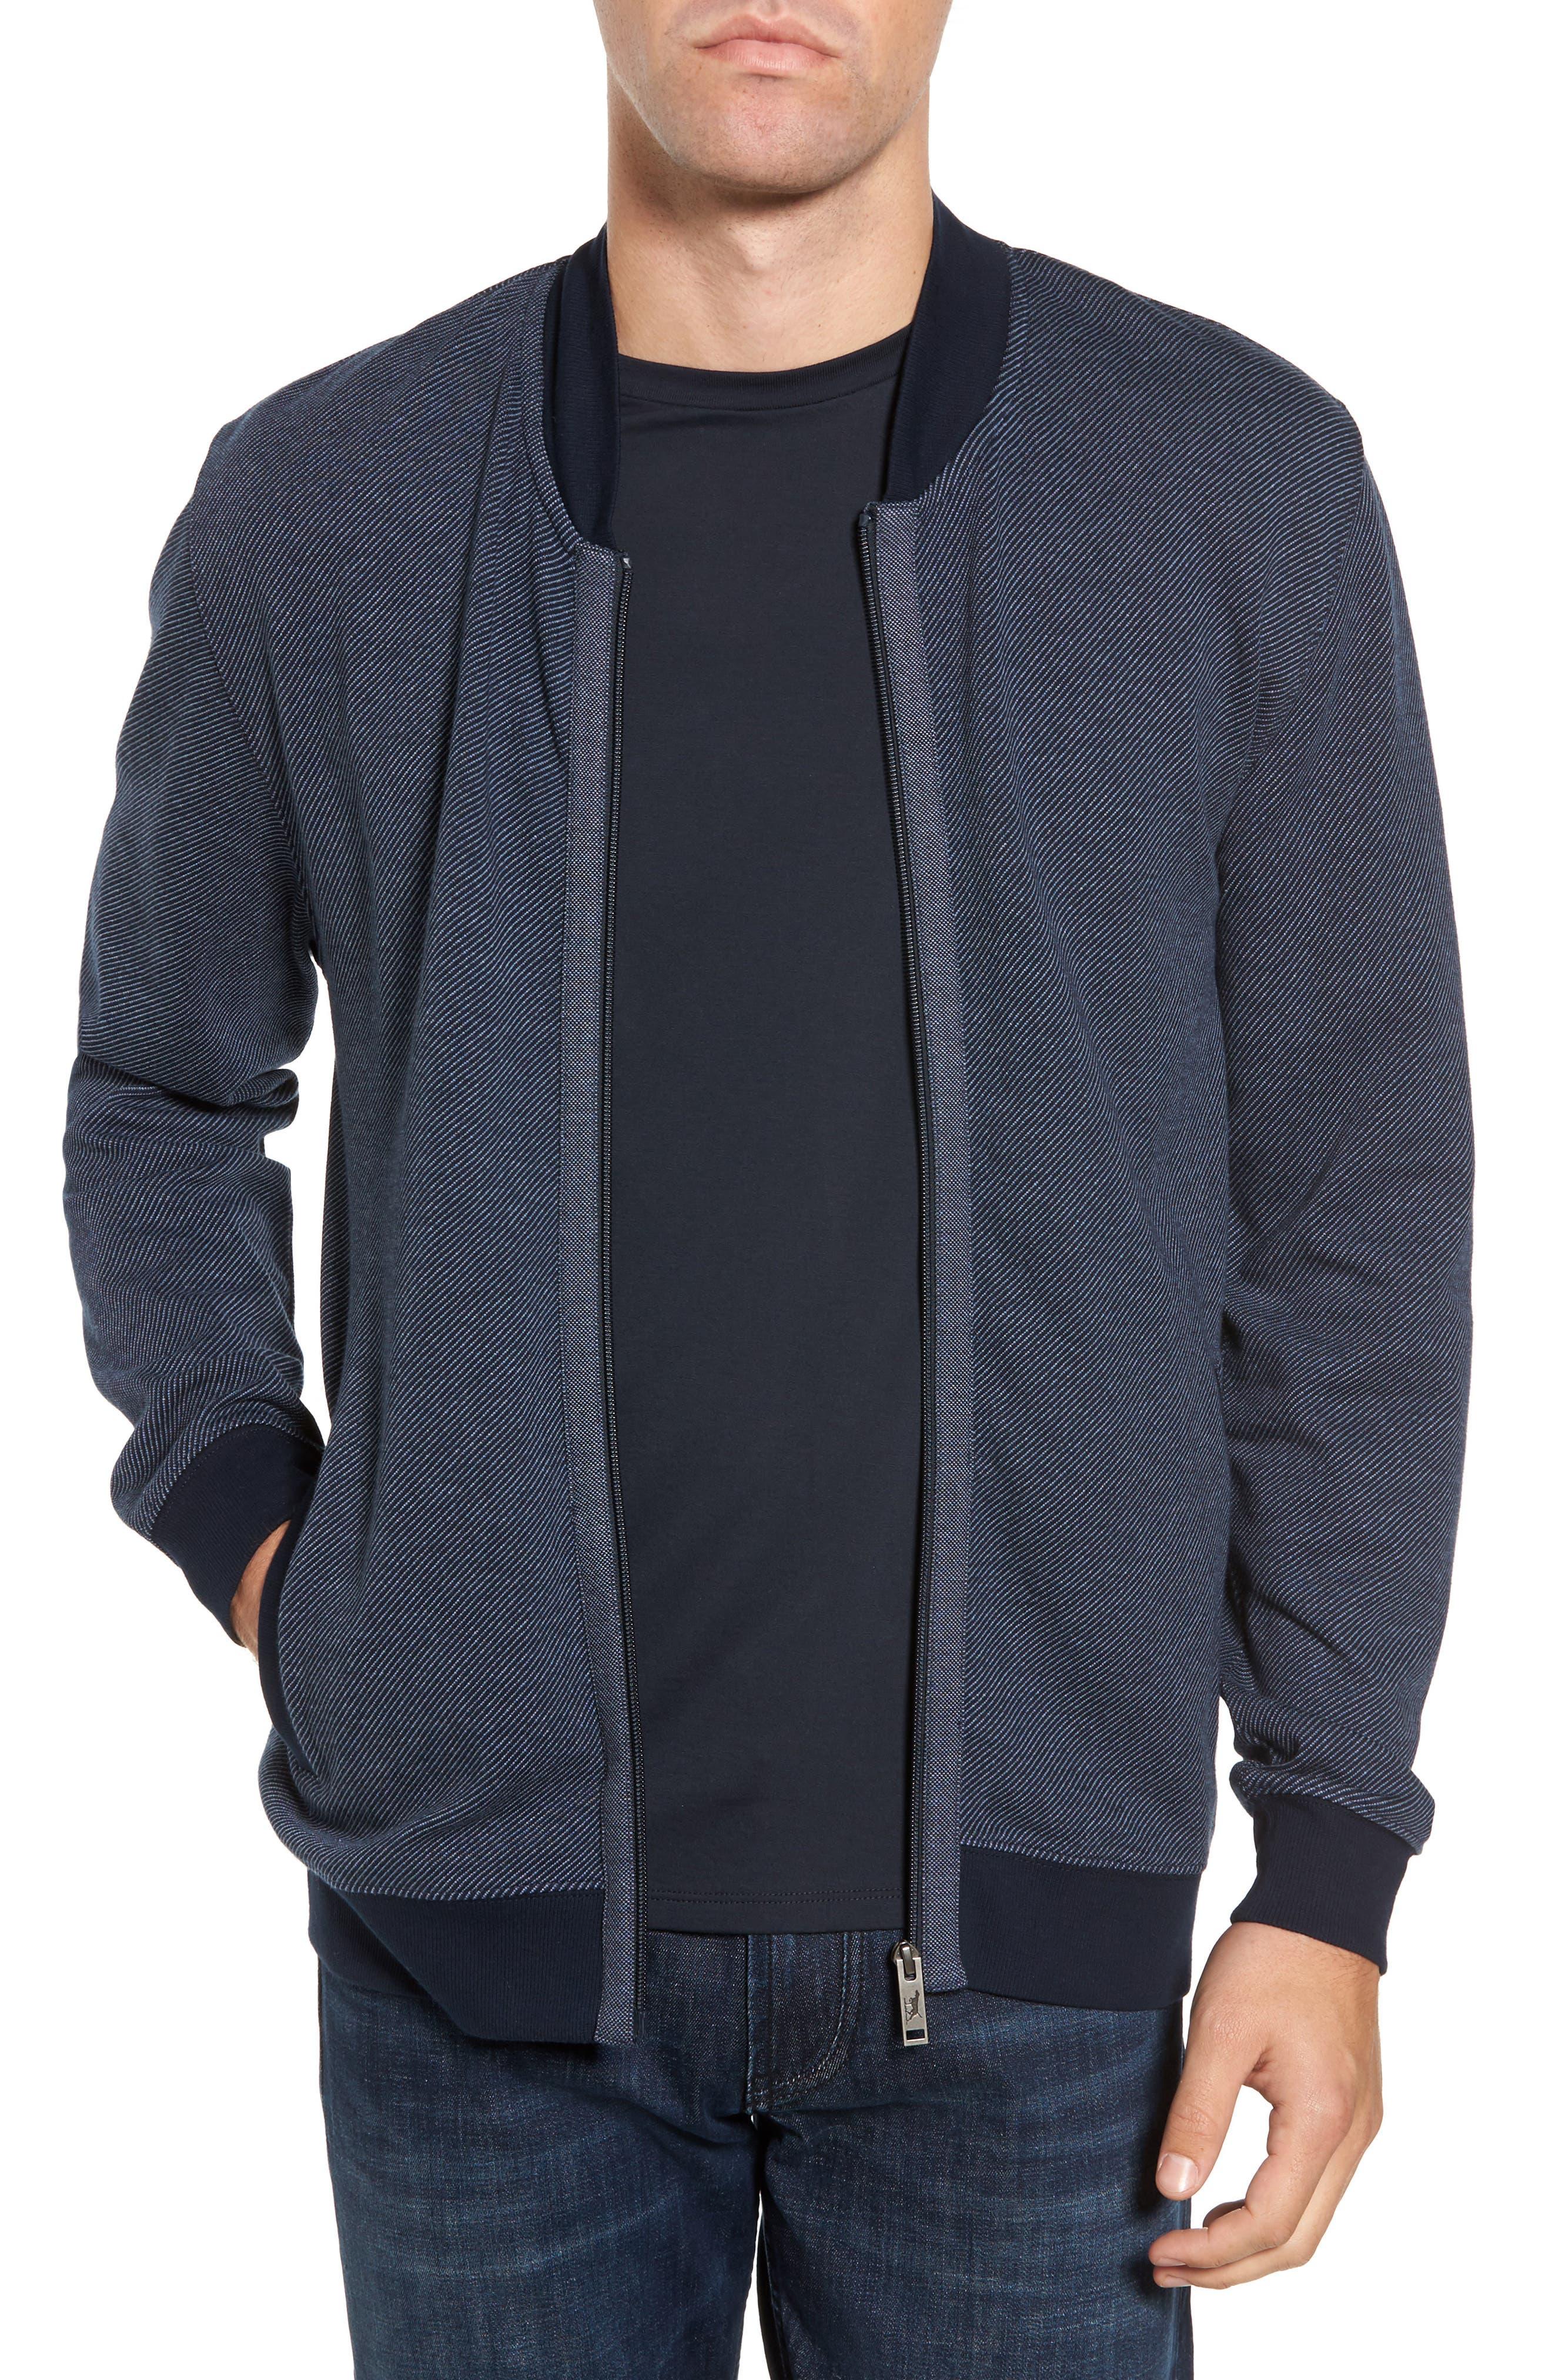 Rodd & Gunn Alderson Ave Fleece Jacket